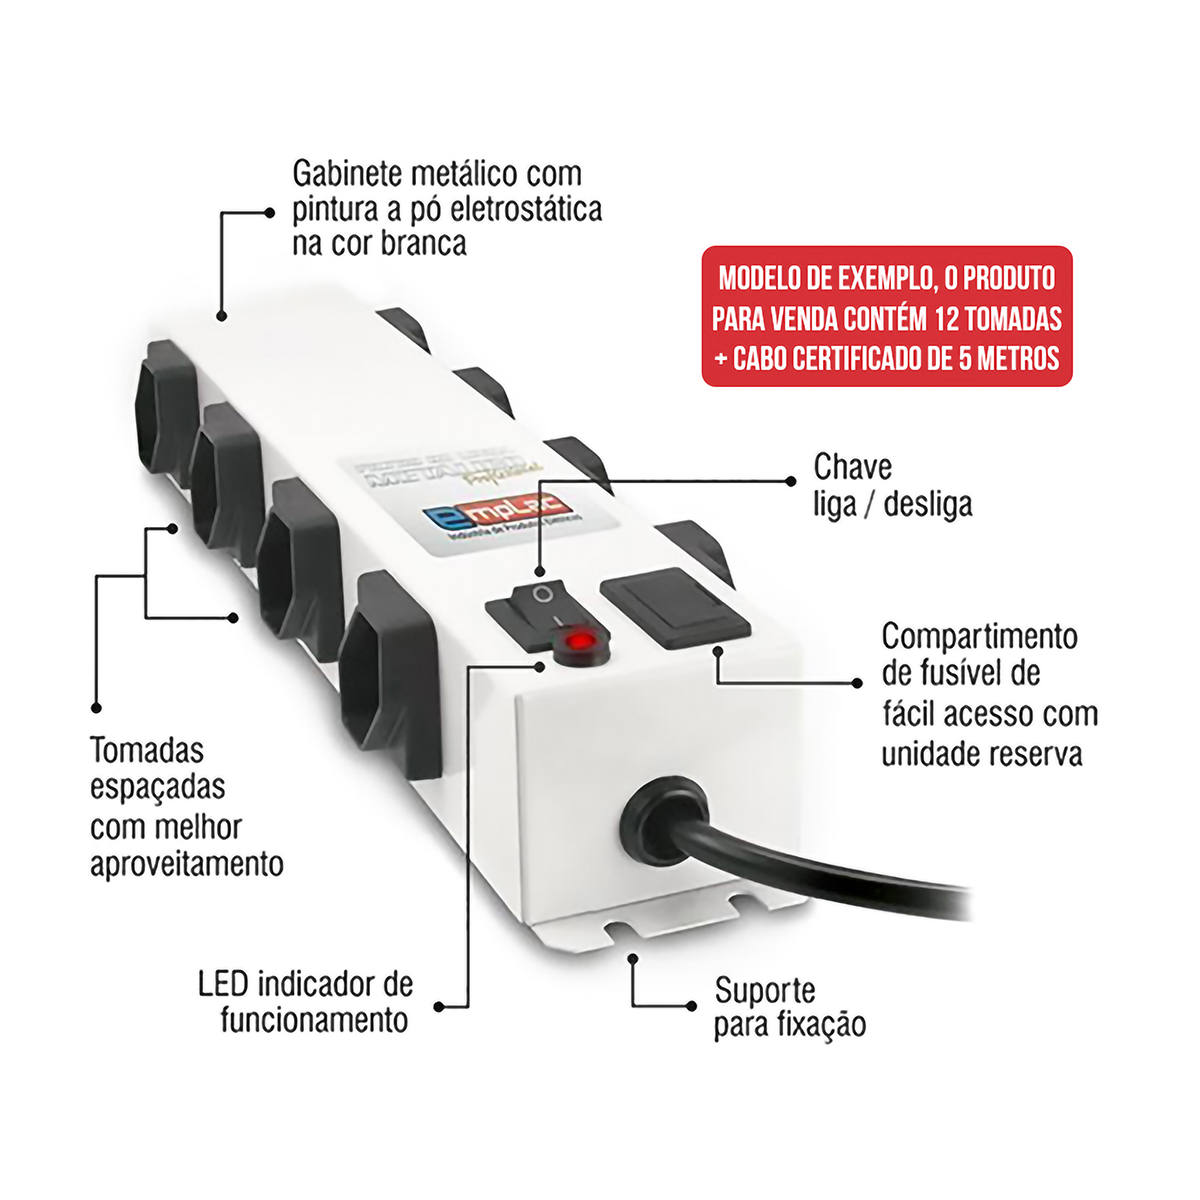 Filtro de Linha 12 Tomadas 10A Metálico Profissional Bivolt Cabo de 5 metros Régua de Energia Emplac F50105